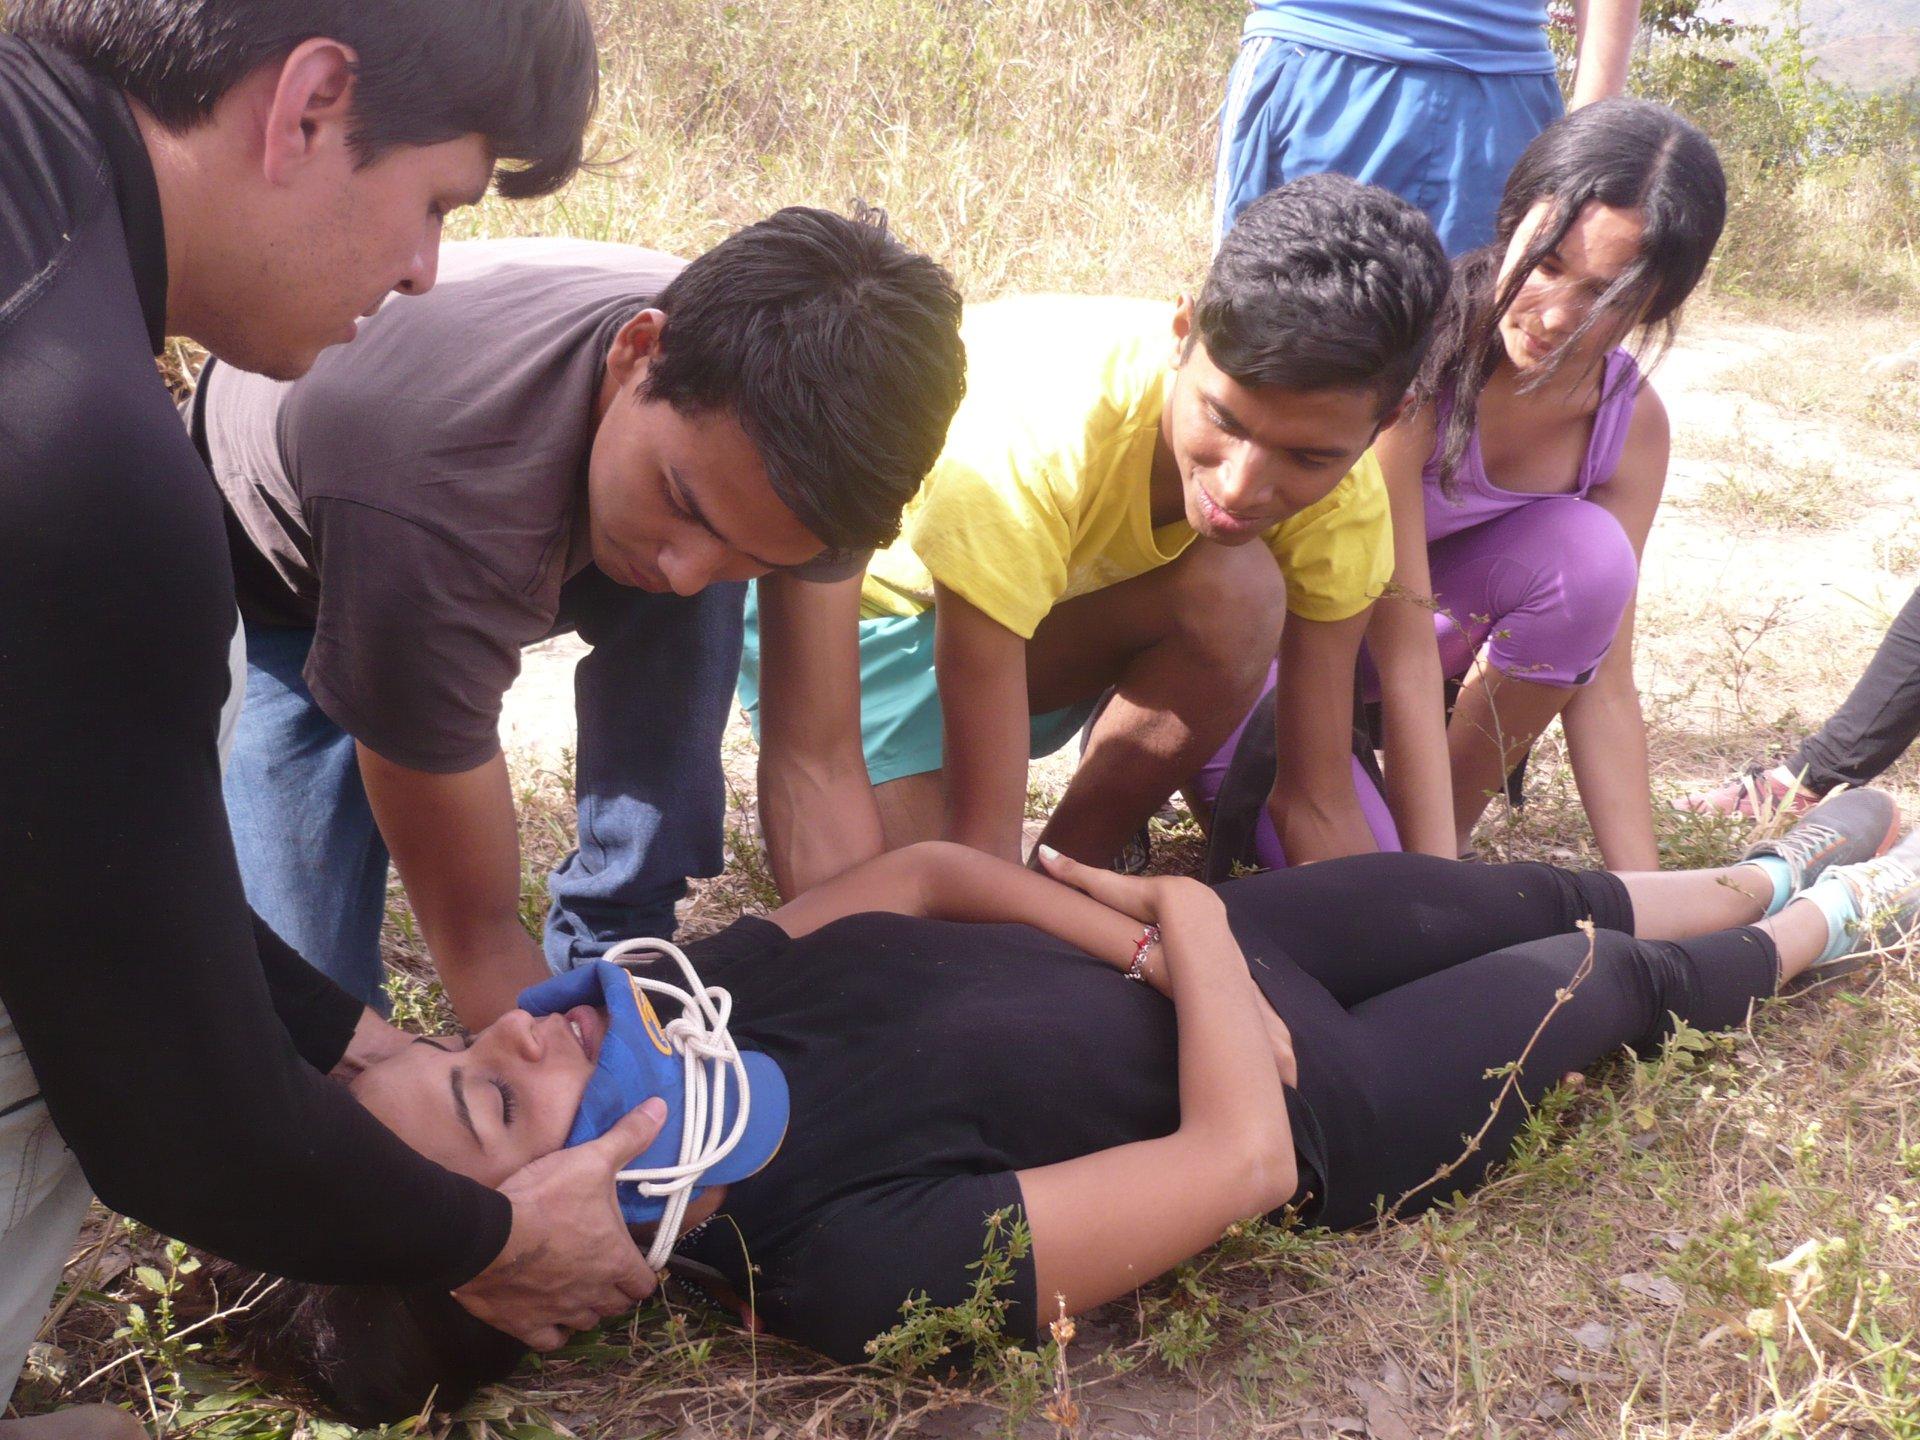 Transportation of Injured People in Outdoors Survival Campout | Monagas, Venezuela | Prof. Juan F. Peraza Marsiglia